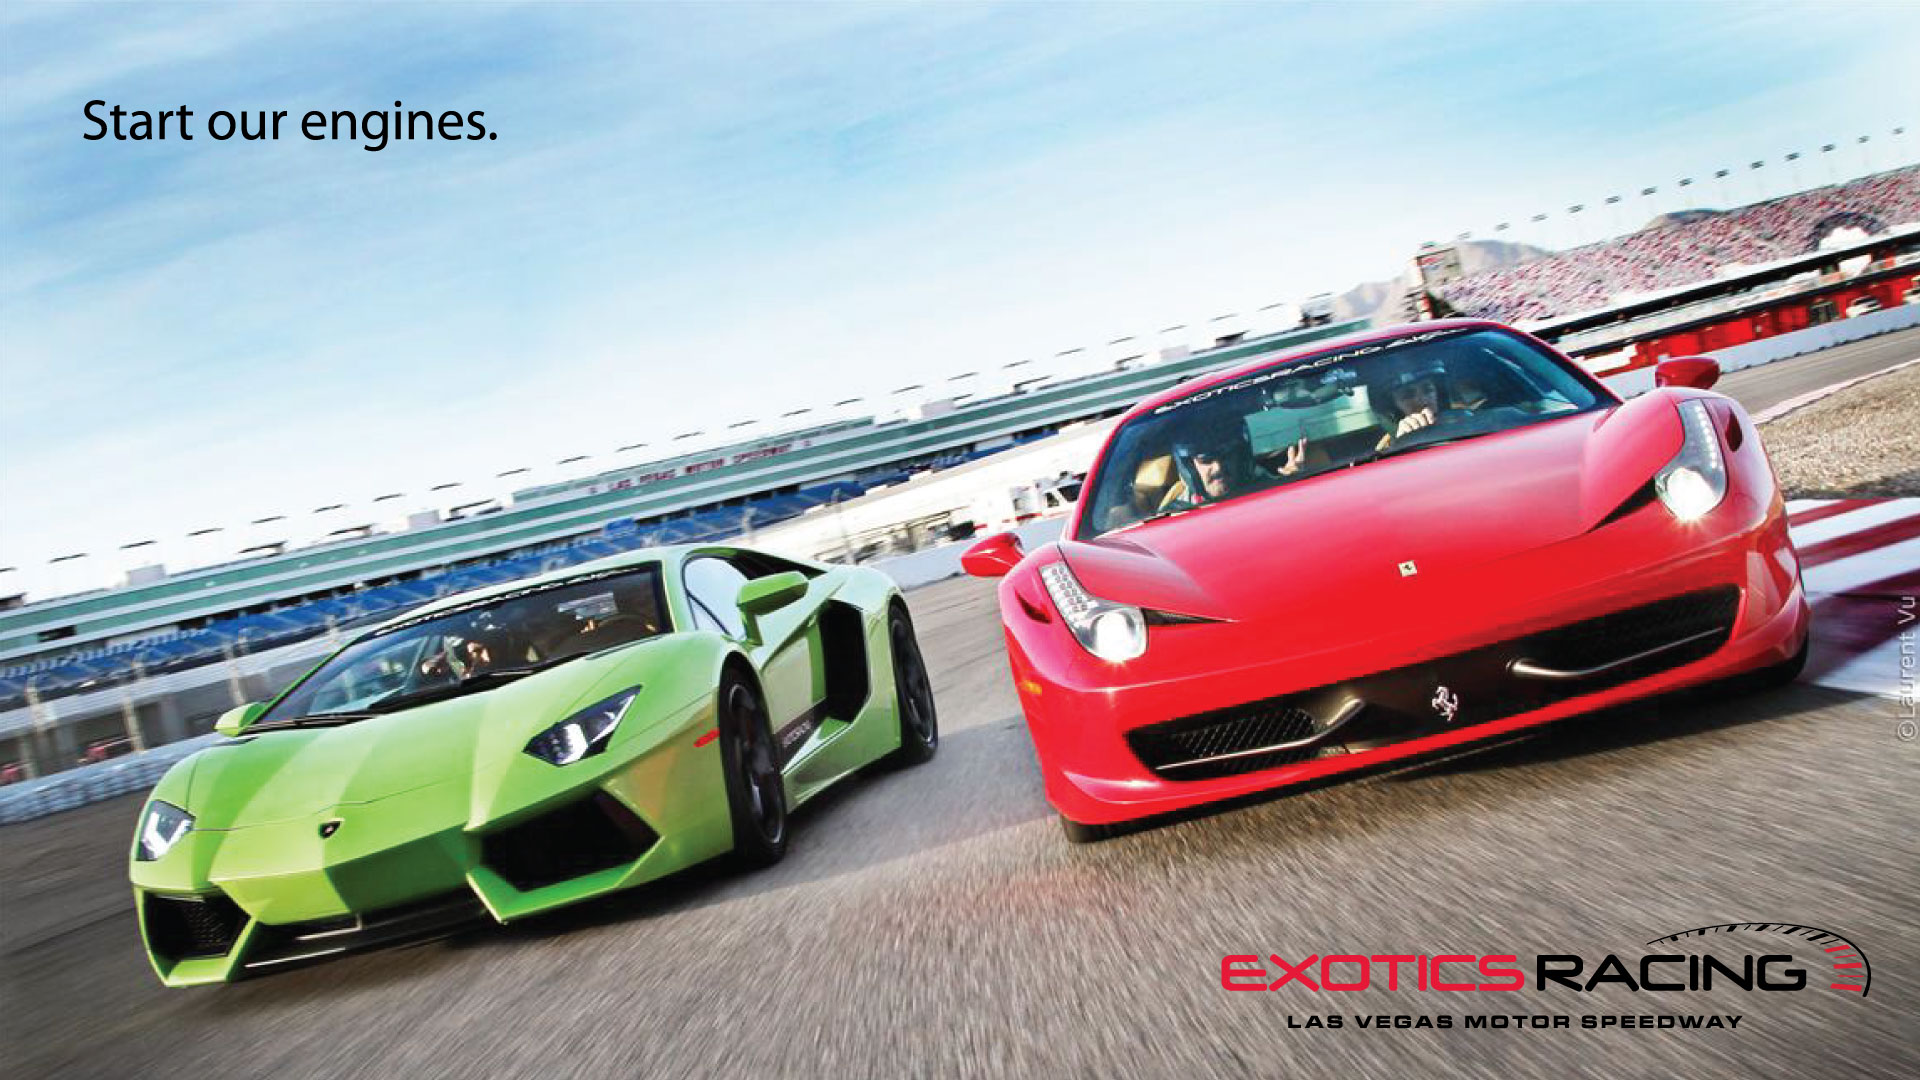 Aventador-Italia-on-track-size-1920x1080-wallpaper-wpc9002442